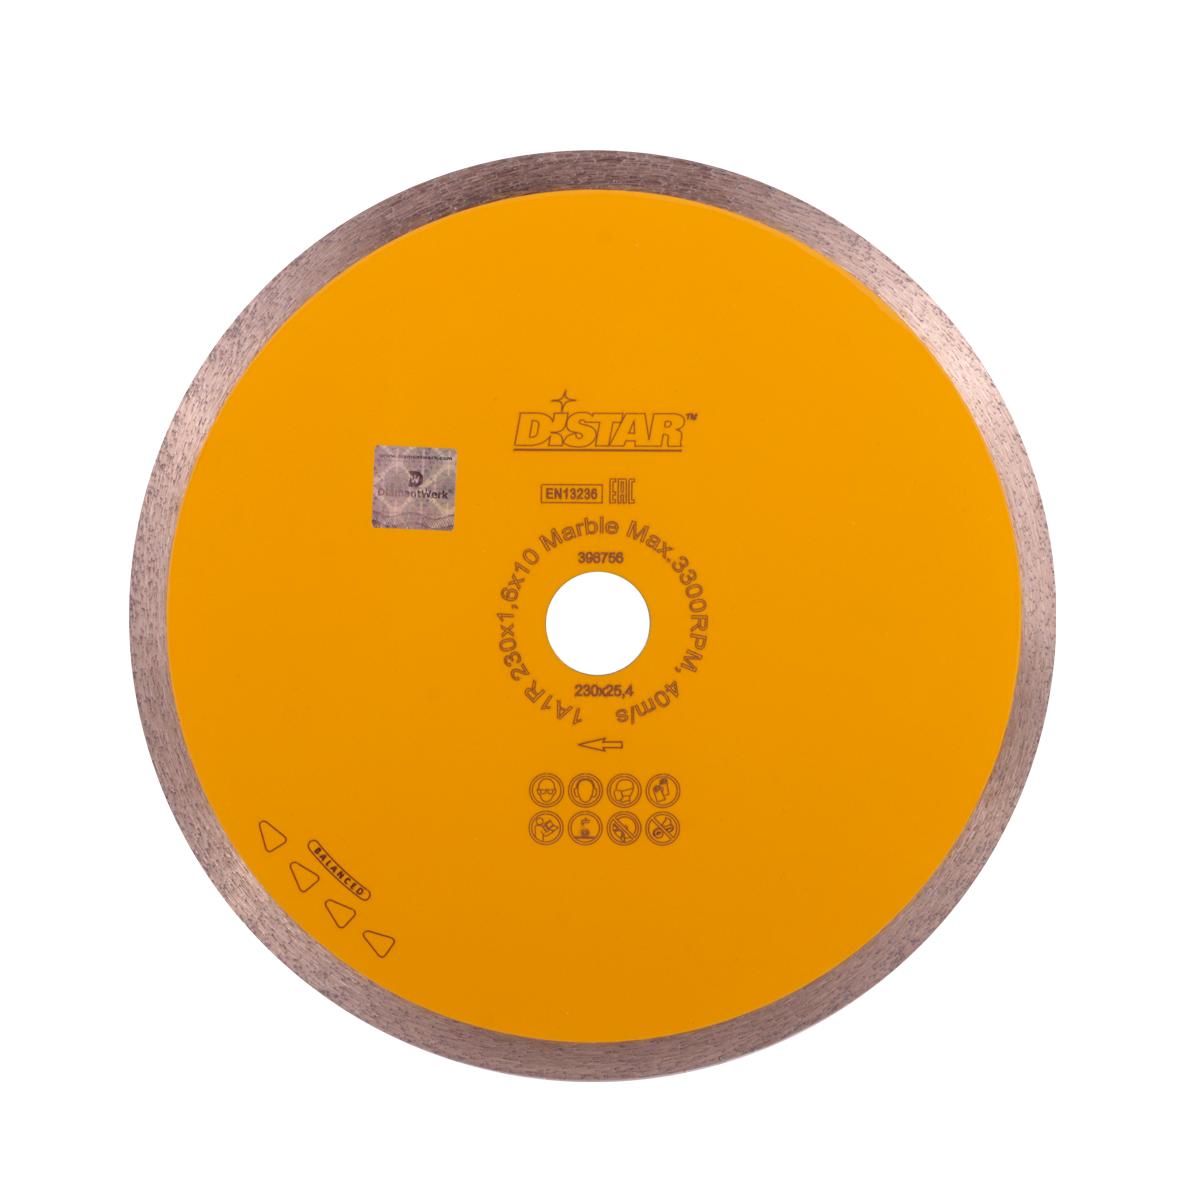 Круг алмазный отрезной Distar 1A1R 230x1,6x10x25,4 Marble